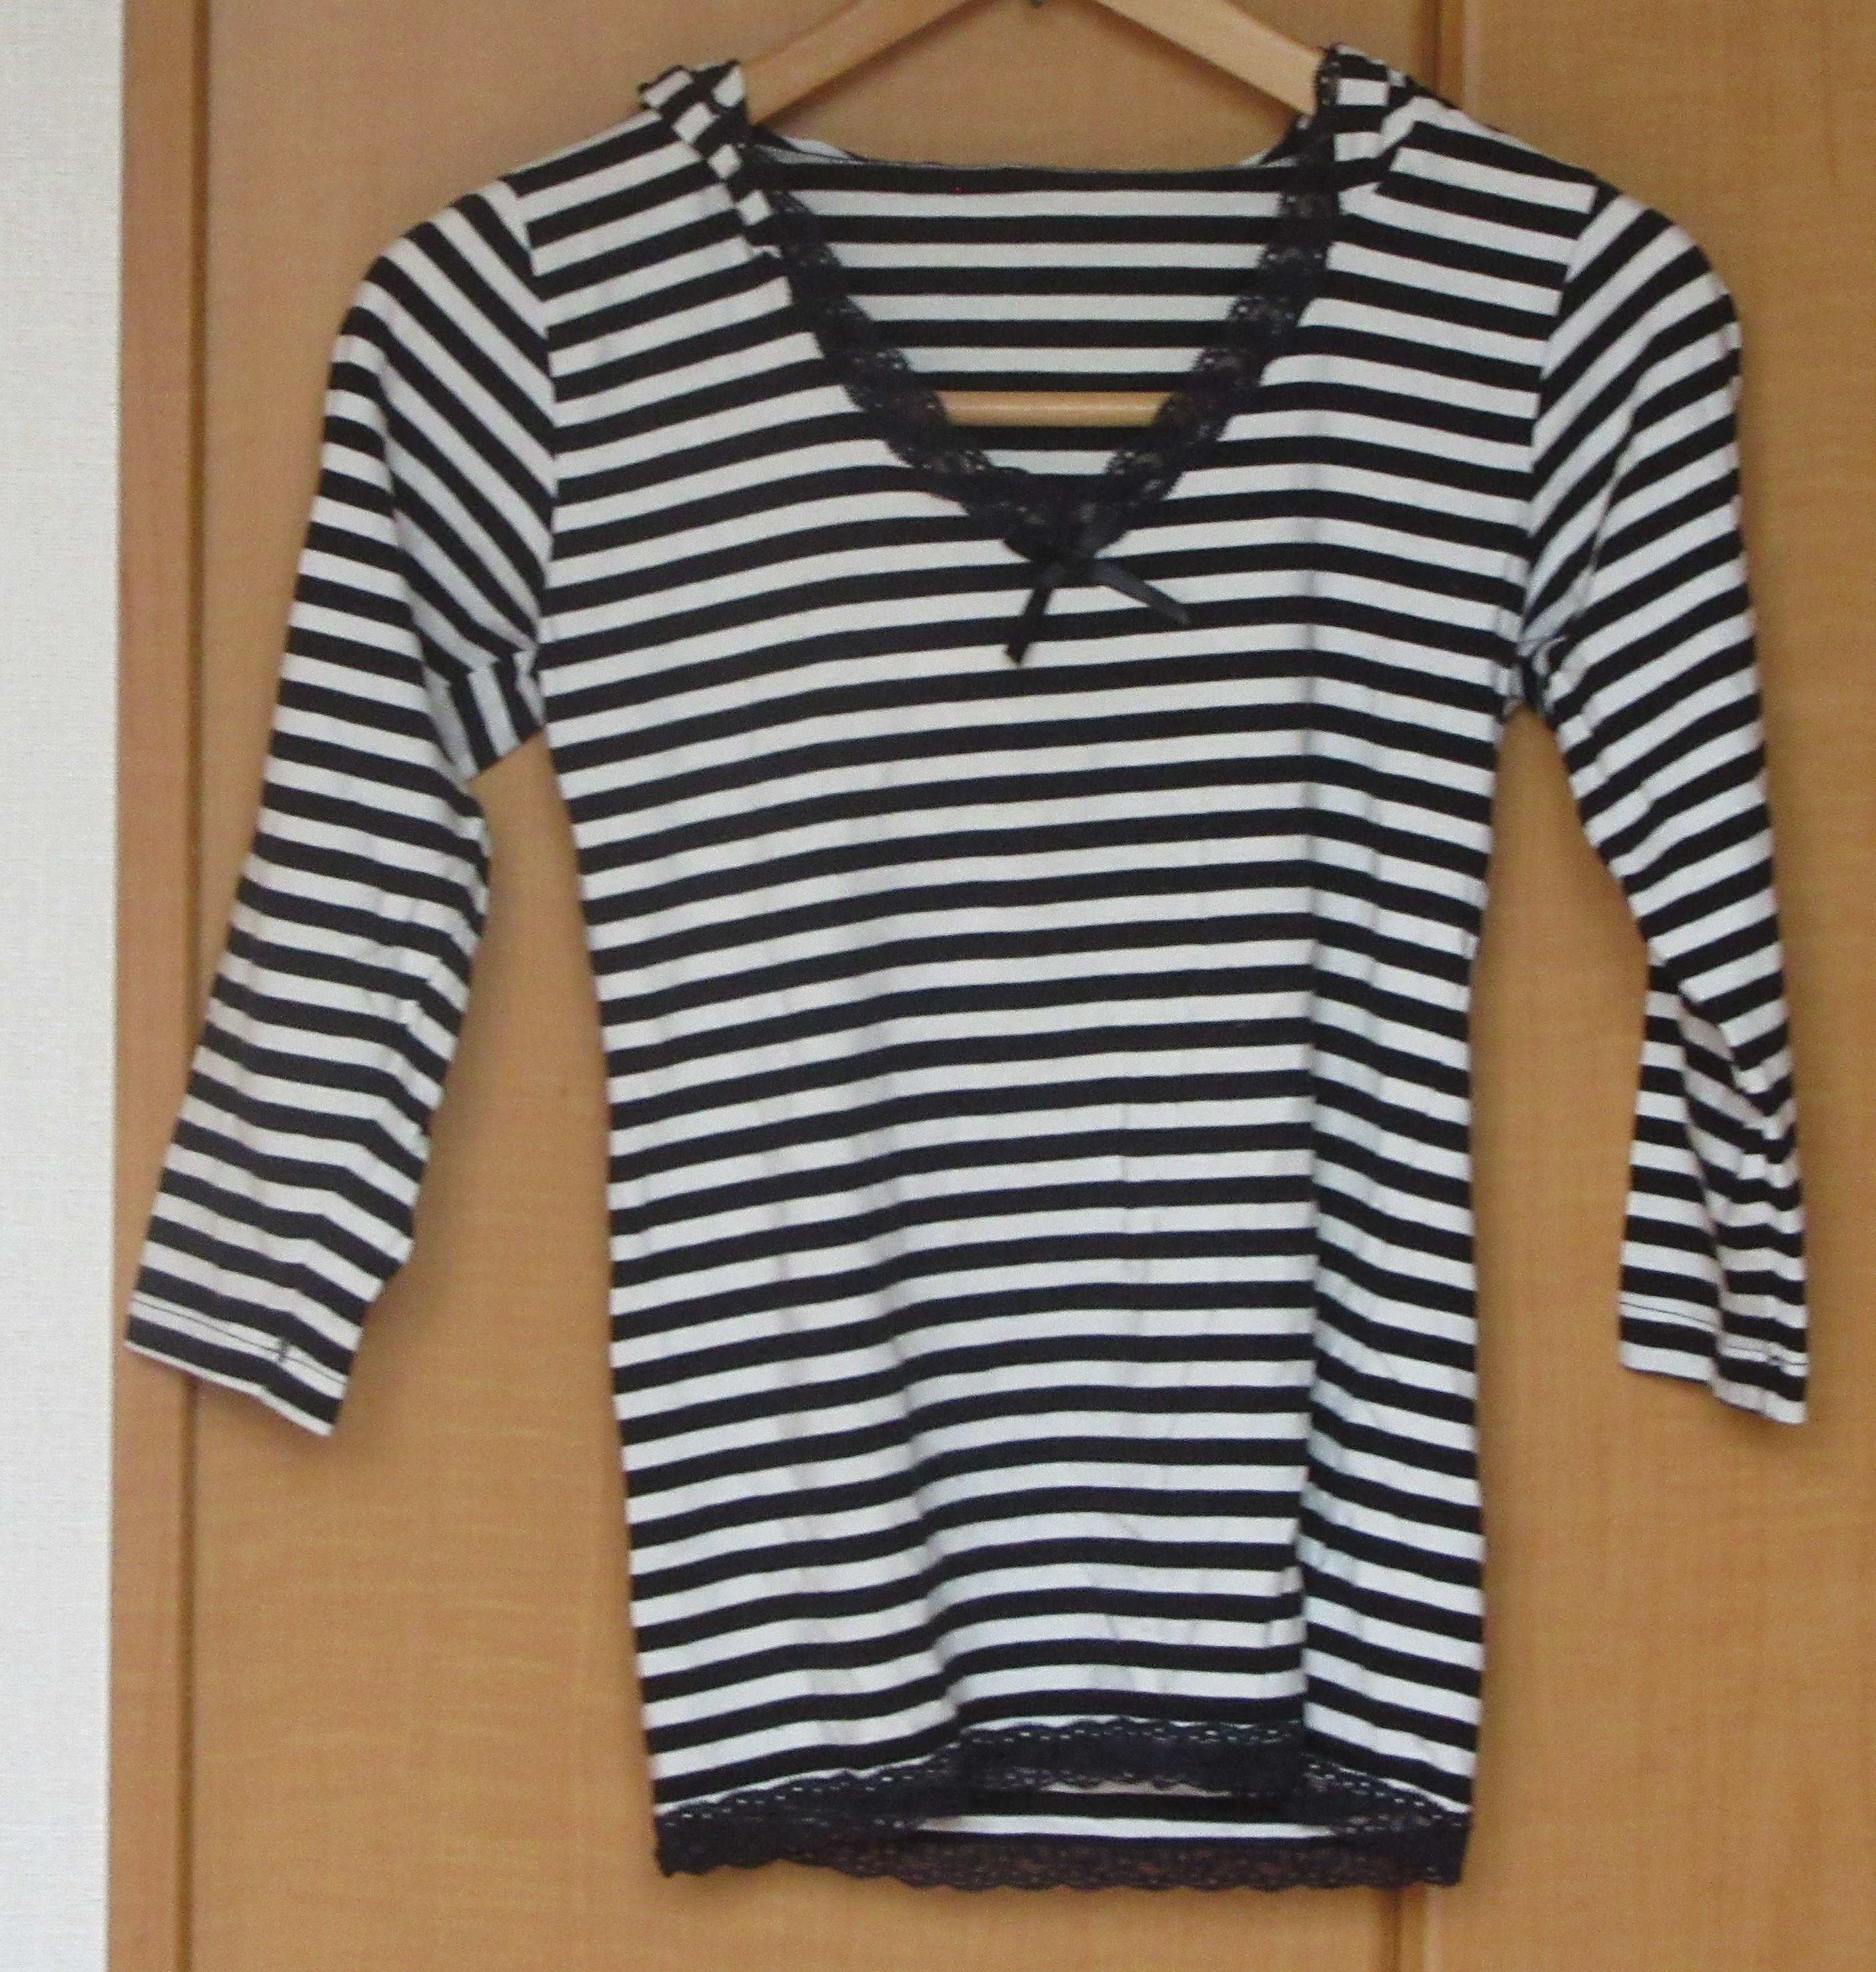 Tシャツ ボーダー フード付 Sサイズ リセール商品